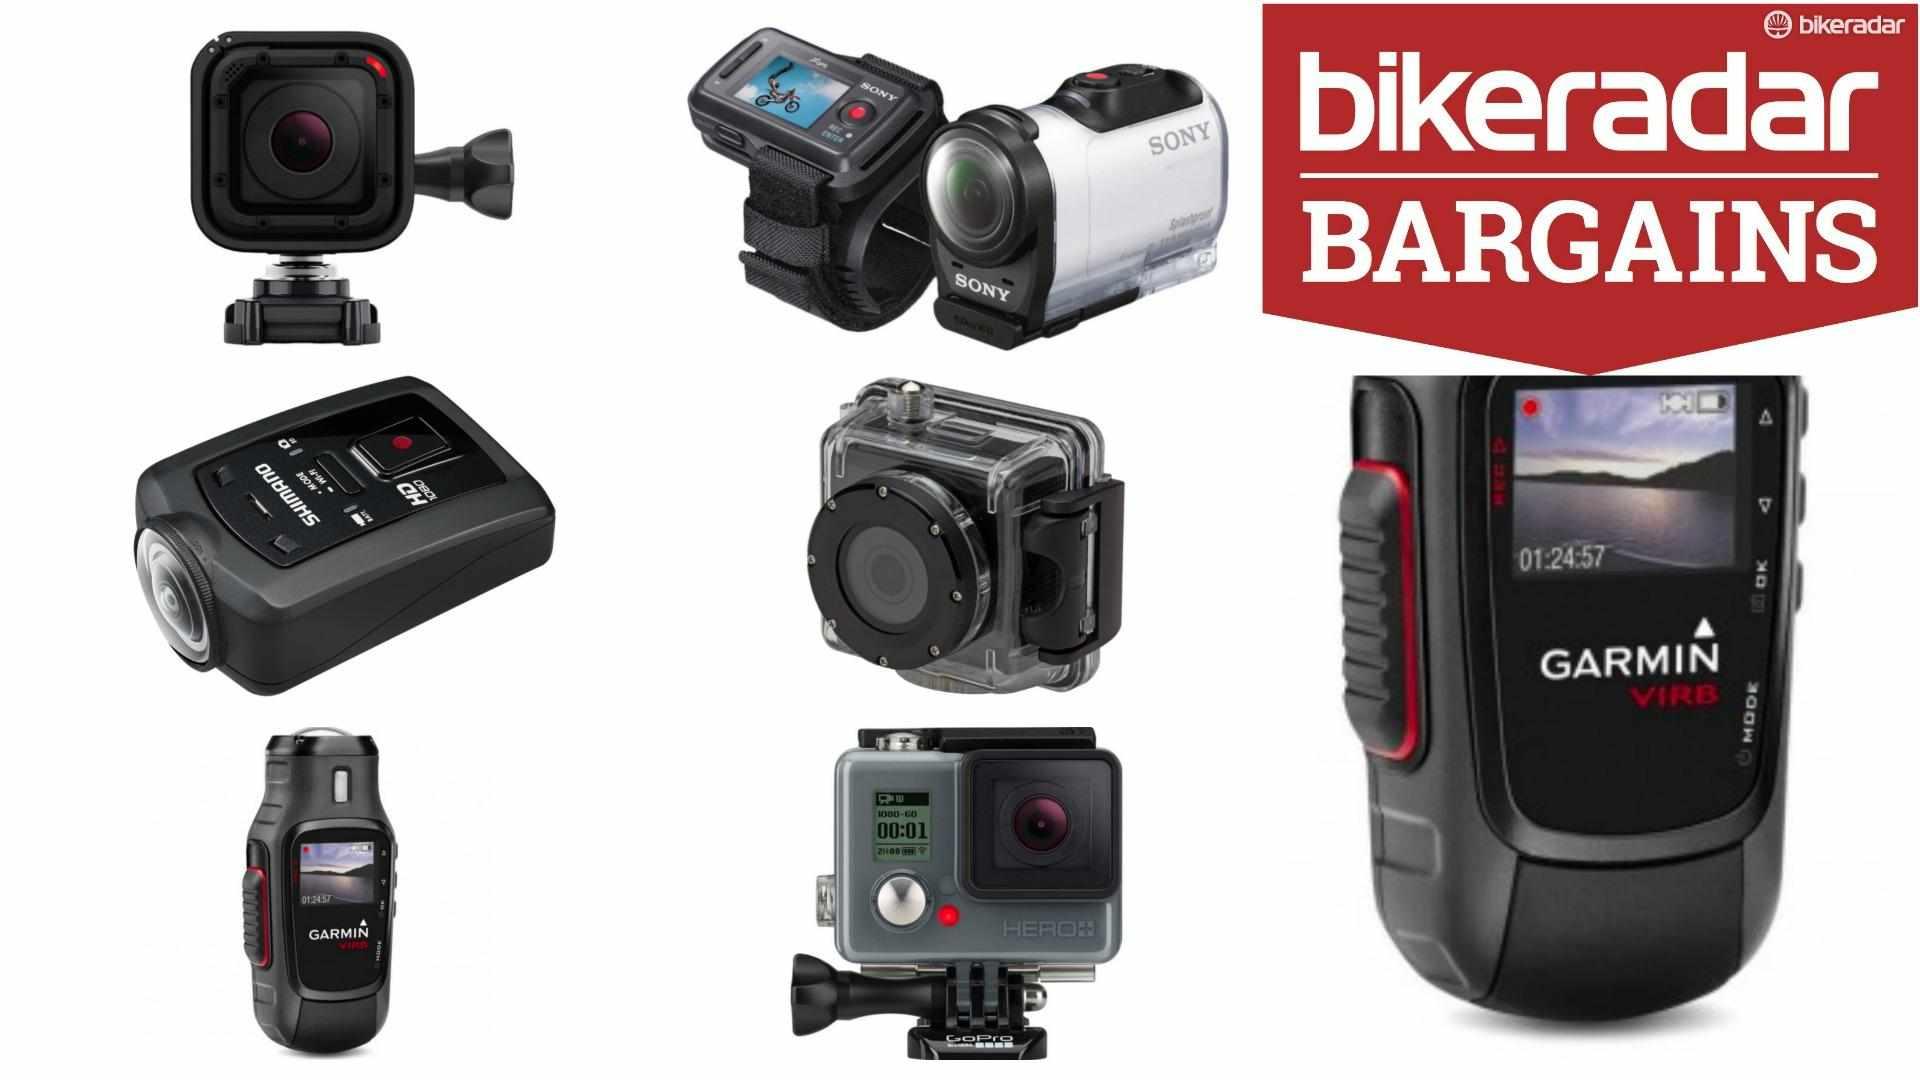 Action camera bargains galore